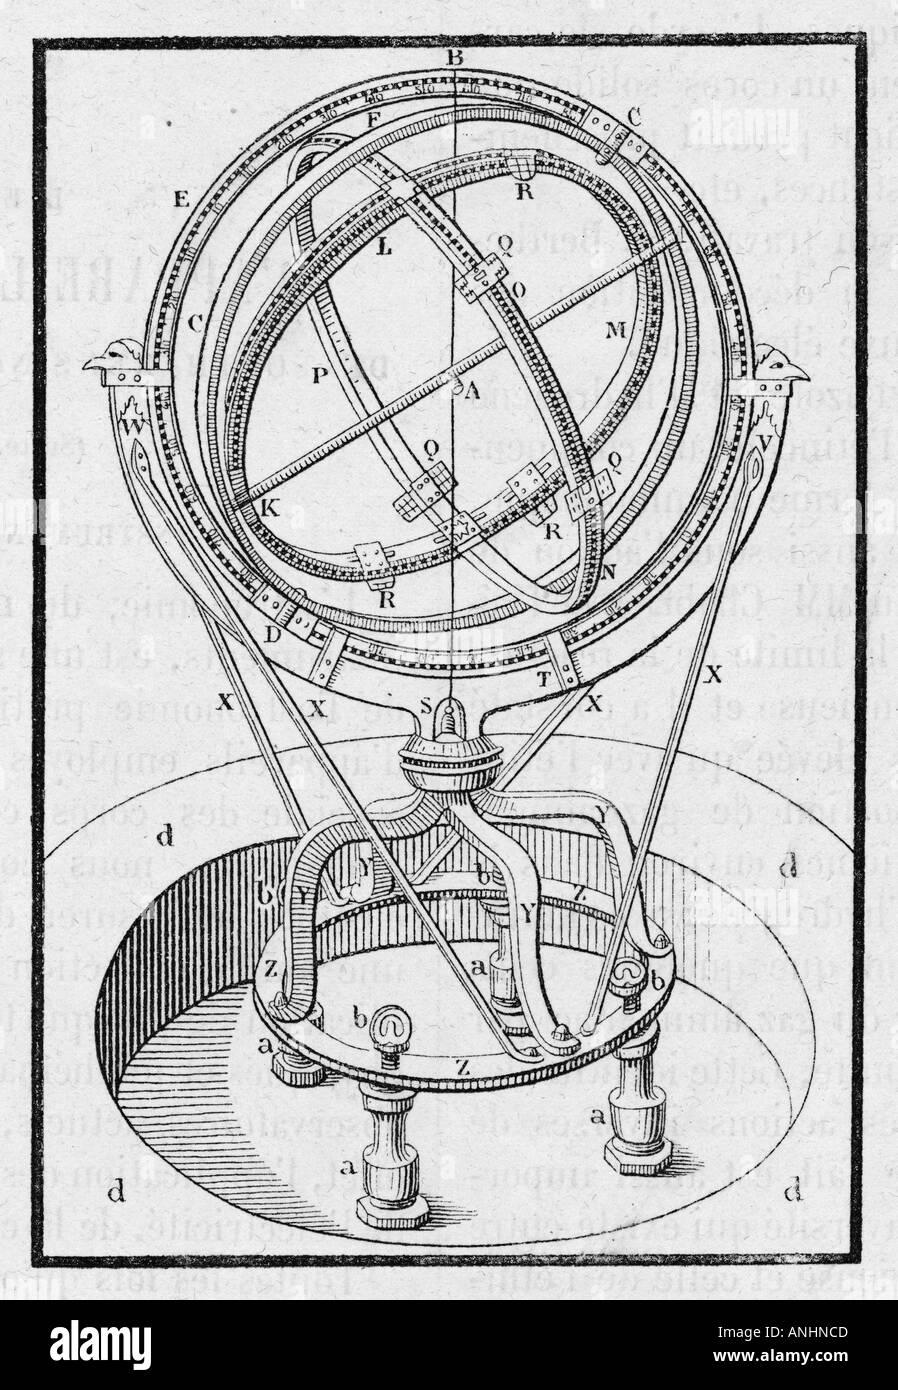 Tycho Brahe Astrolabe - Stock Image